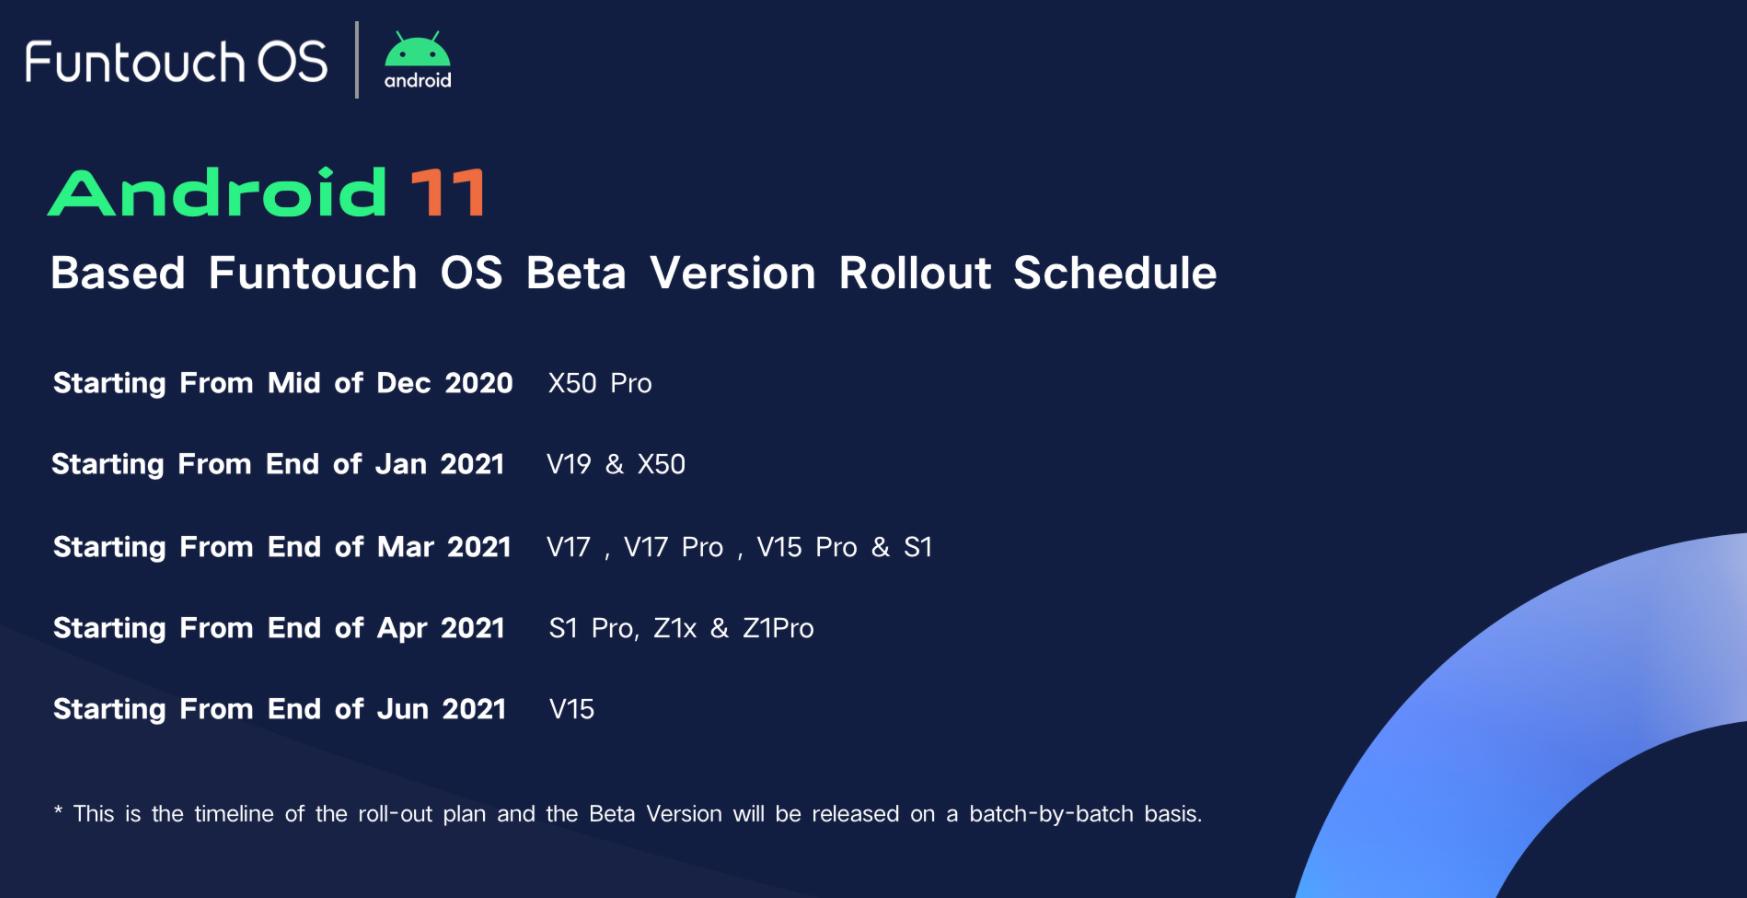 Vivo Funtouch OS Android 11